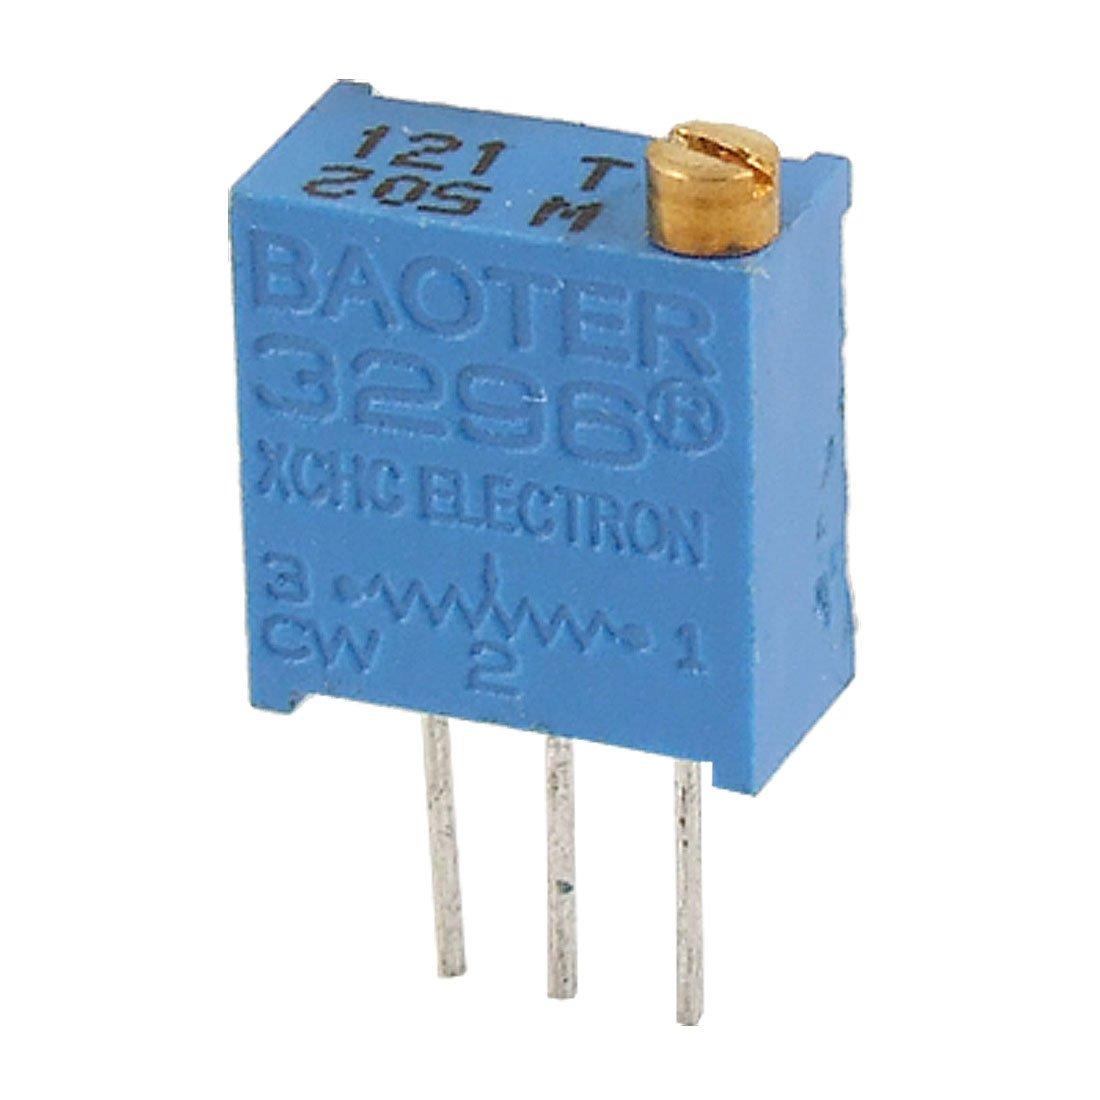 Blue Sourcingmap a14052200ux0350 5 Pcs 50 Ohm 3 Pins 25 Turn Potentiometer Pot Variable Resistor